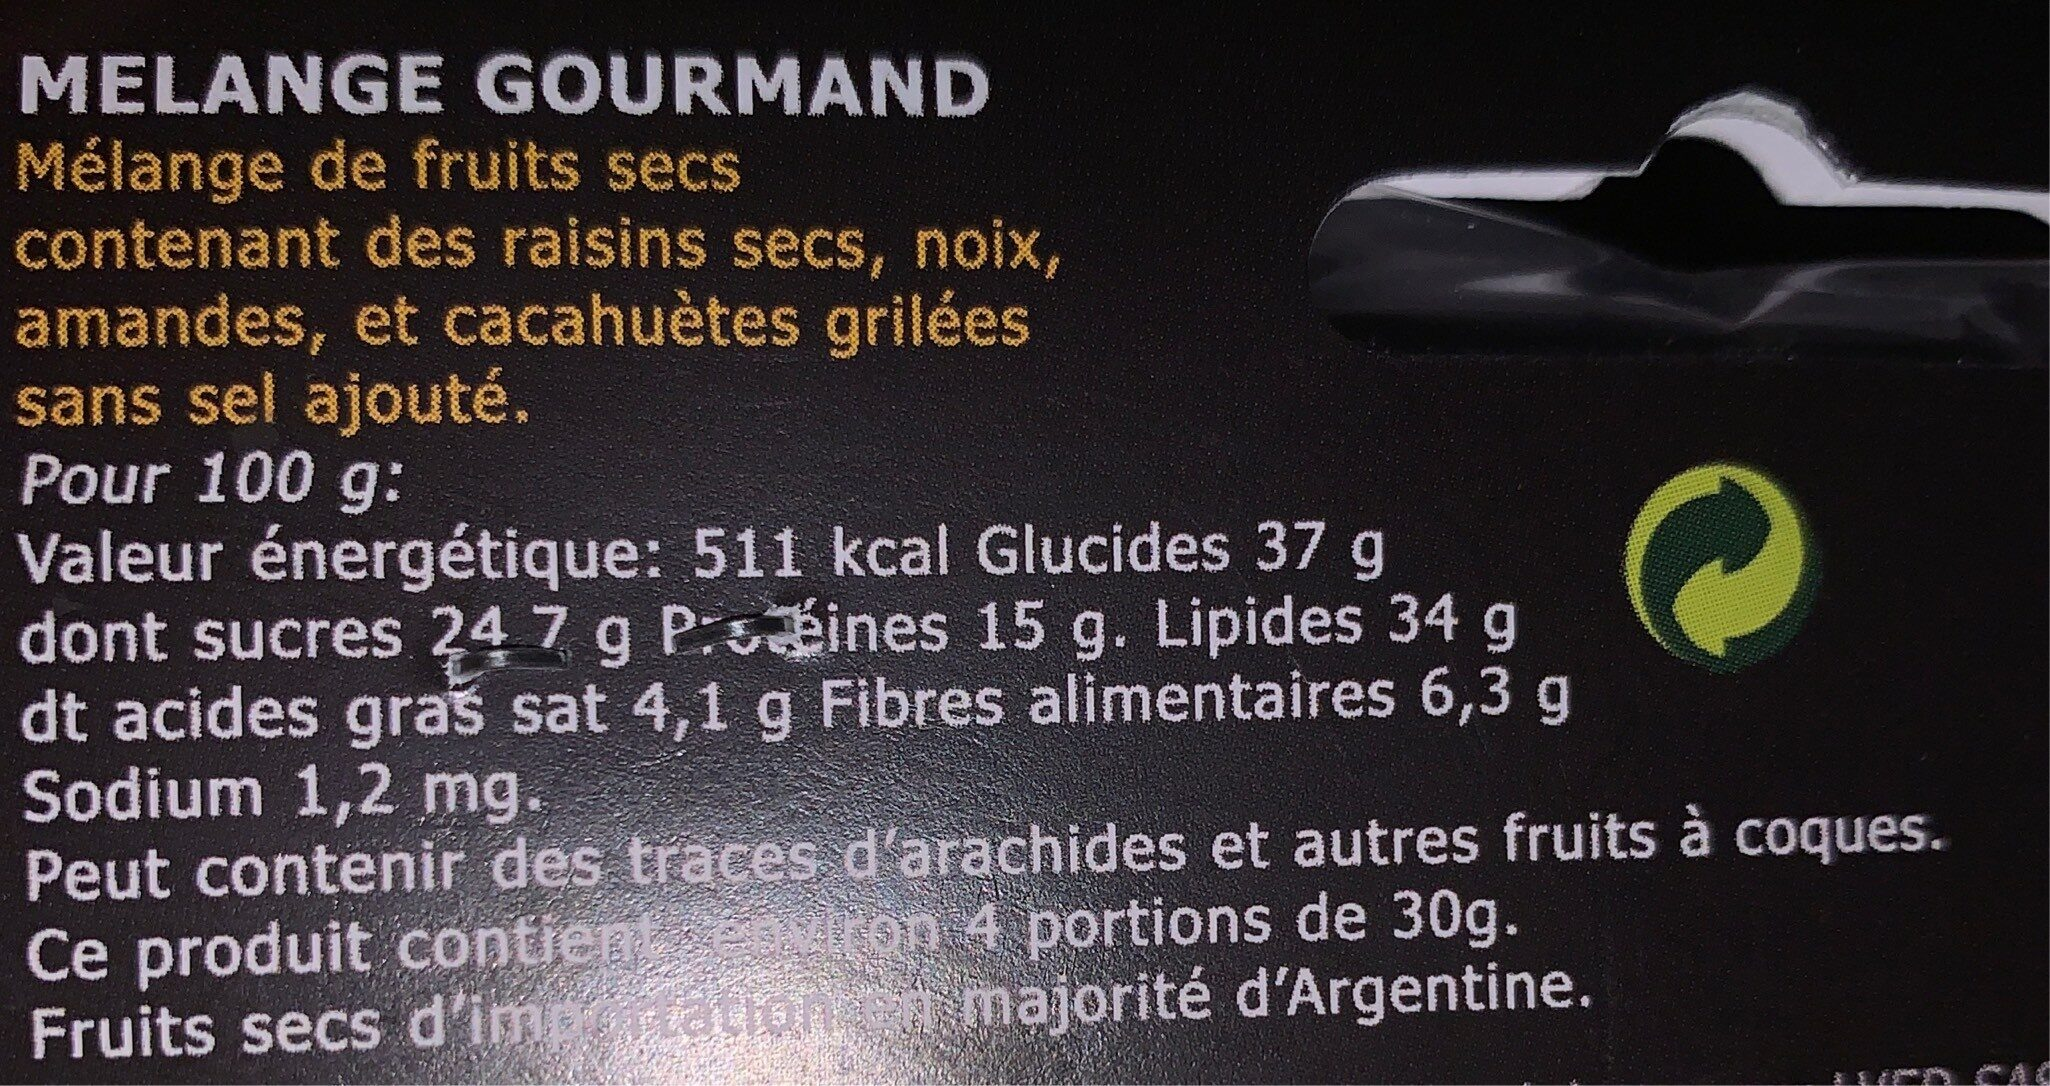 Melange gourmand - Nutrition facts